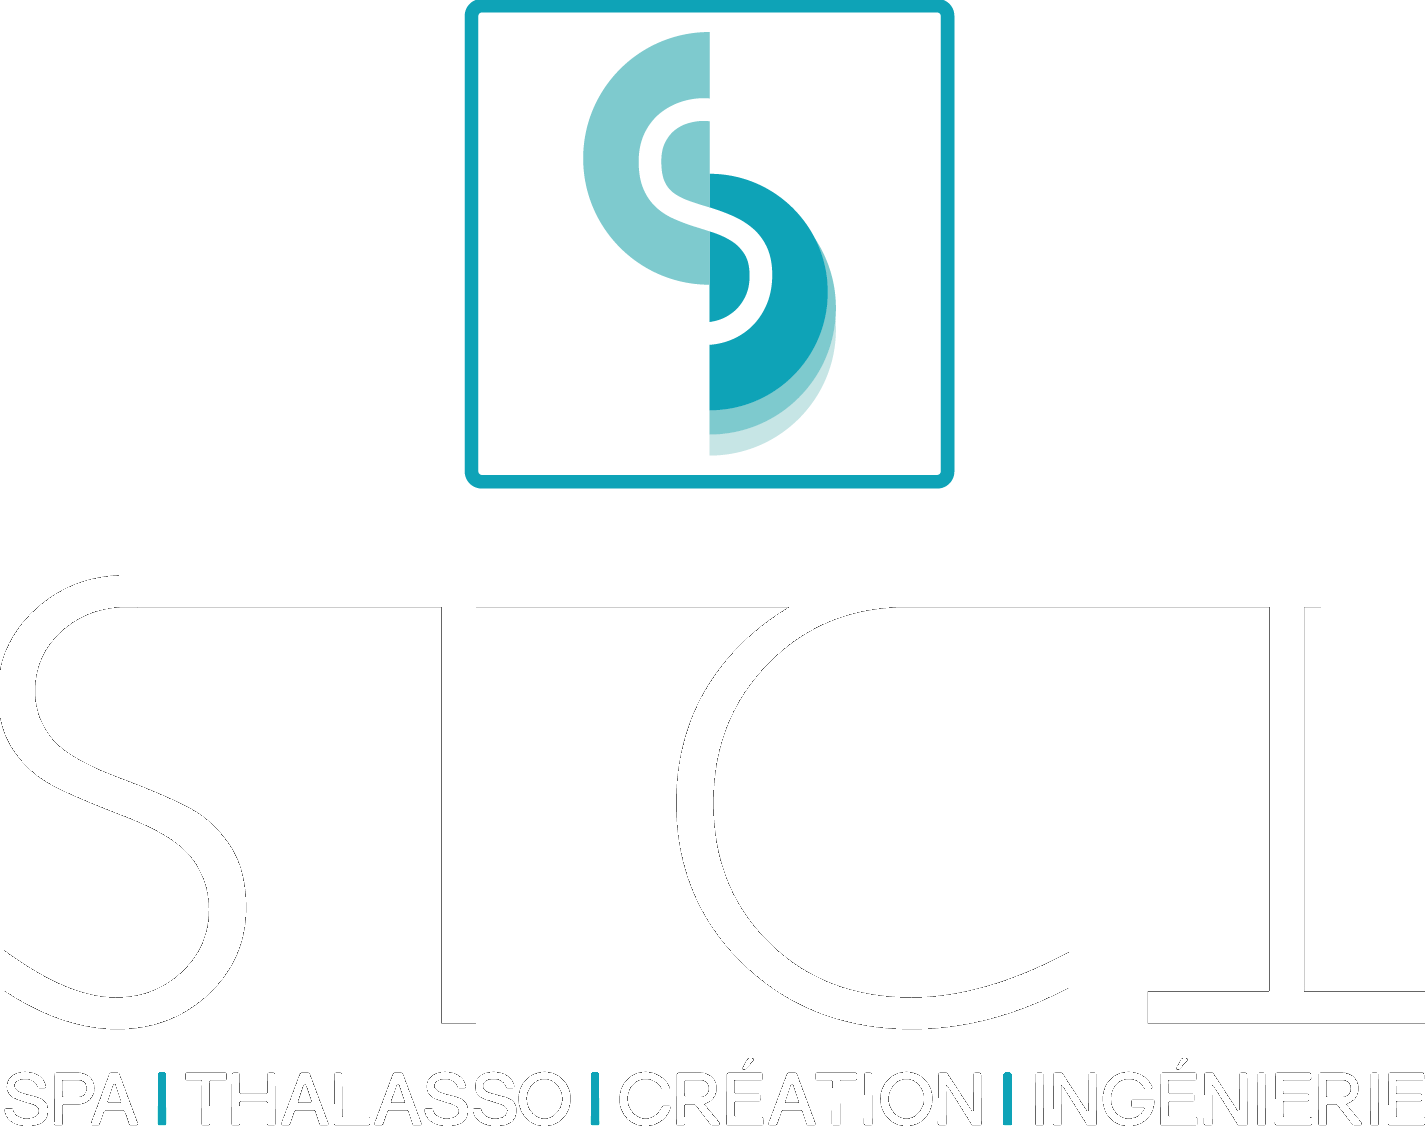 Spa Thalasso Création Ingénierie